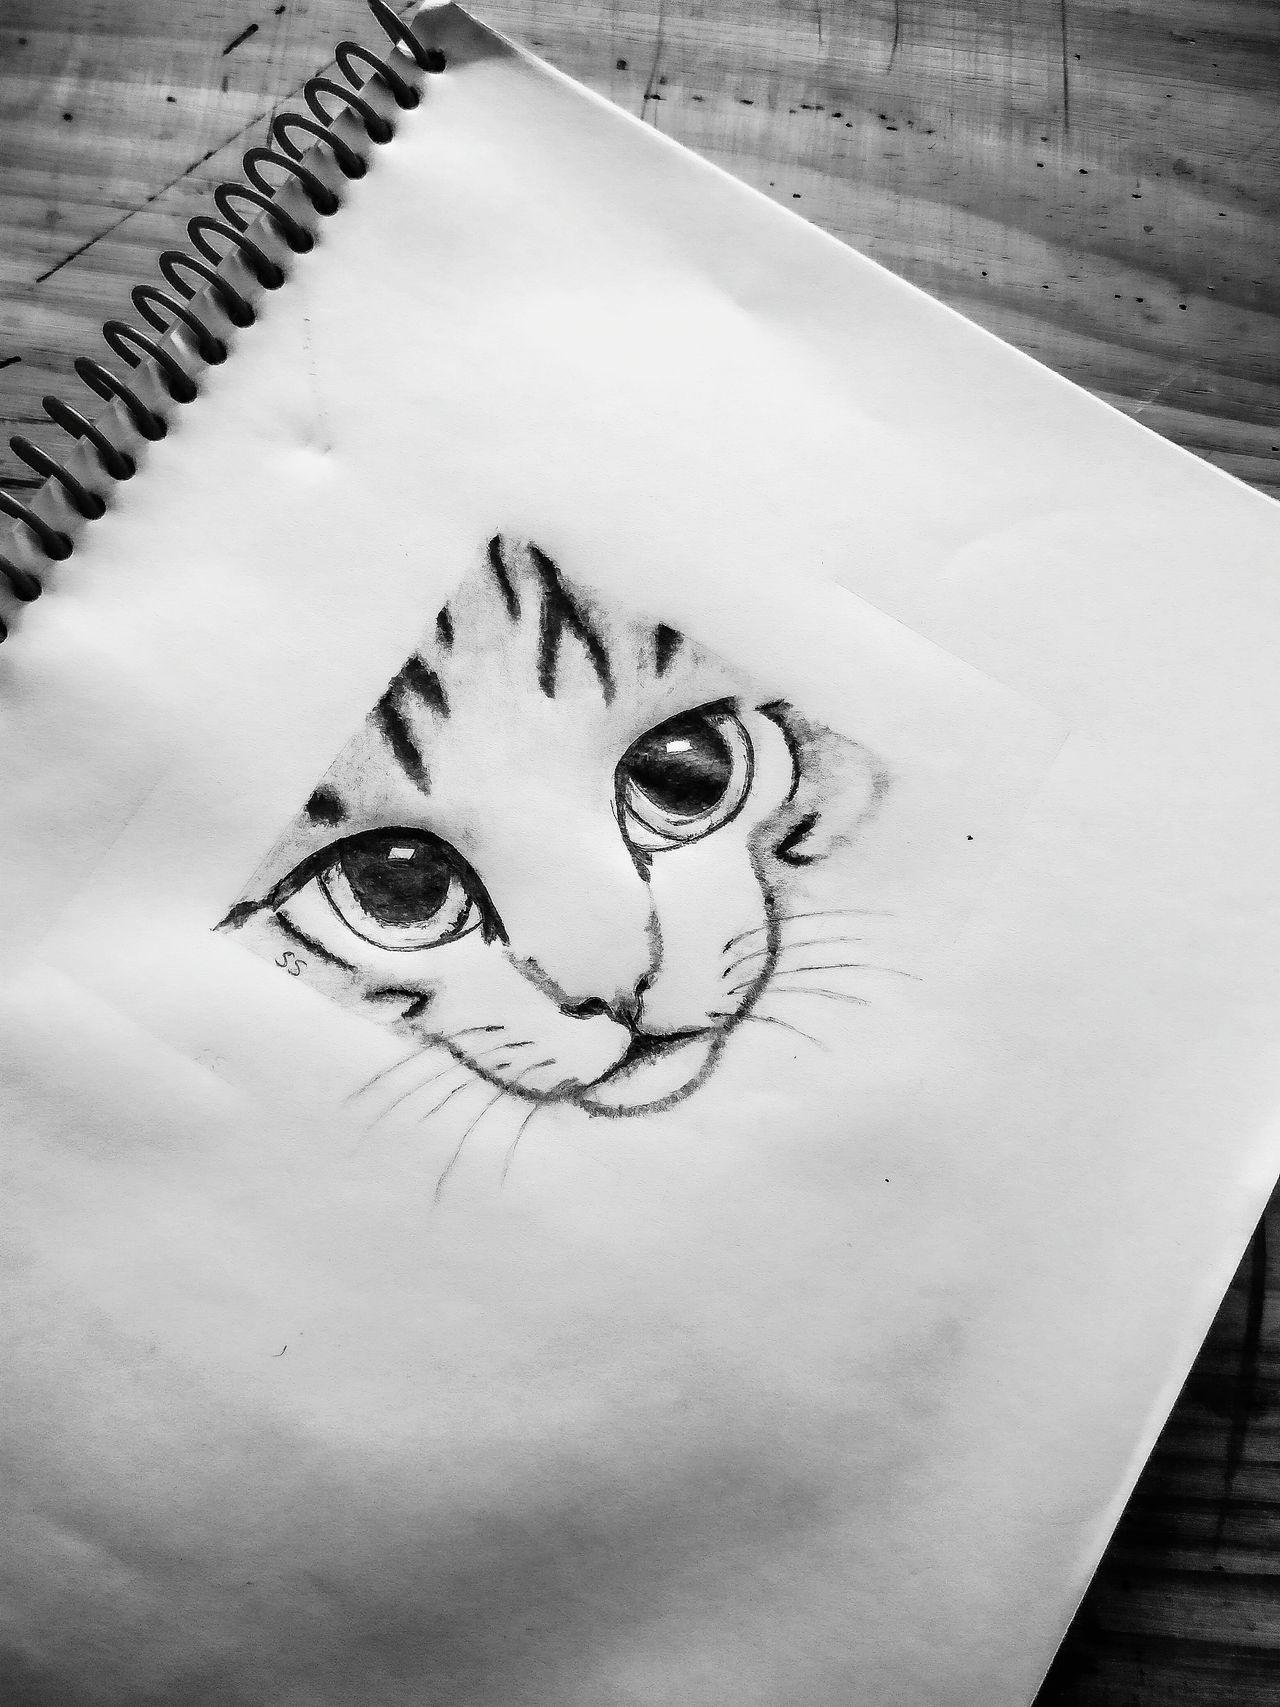 Love Heart Shape Close-up Smiling Nature No People Outdoors Day Cat Sketching Sketch Art Sketchbook Cat Sketch EyeEm Gallery EyeEmNewHere